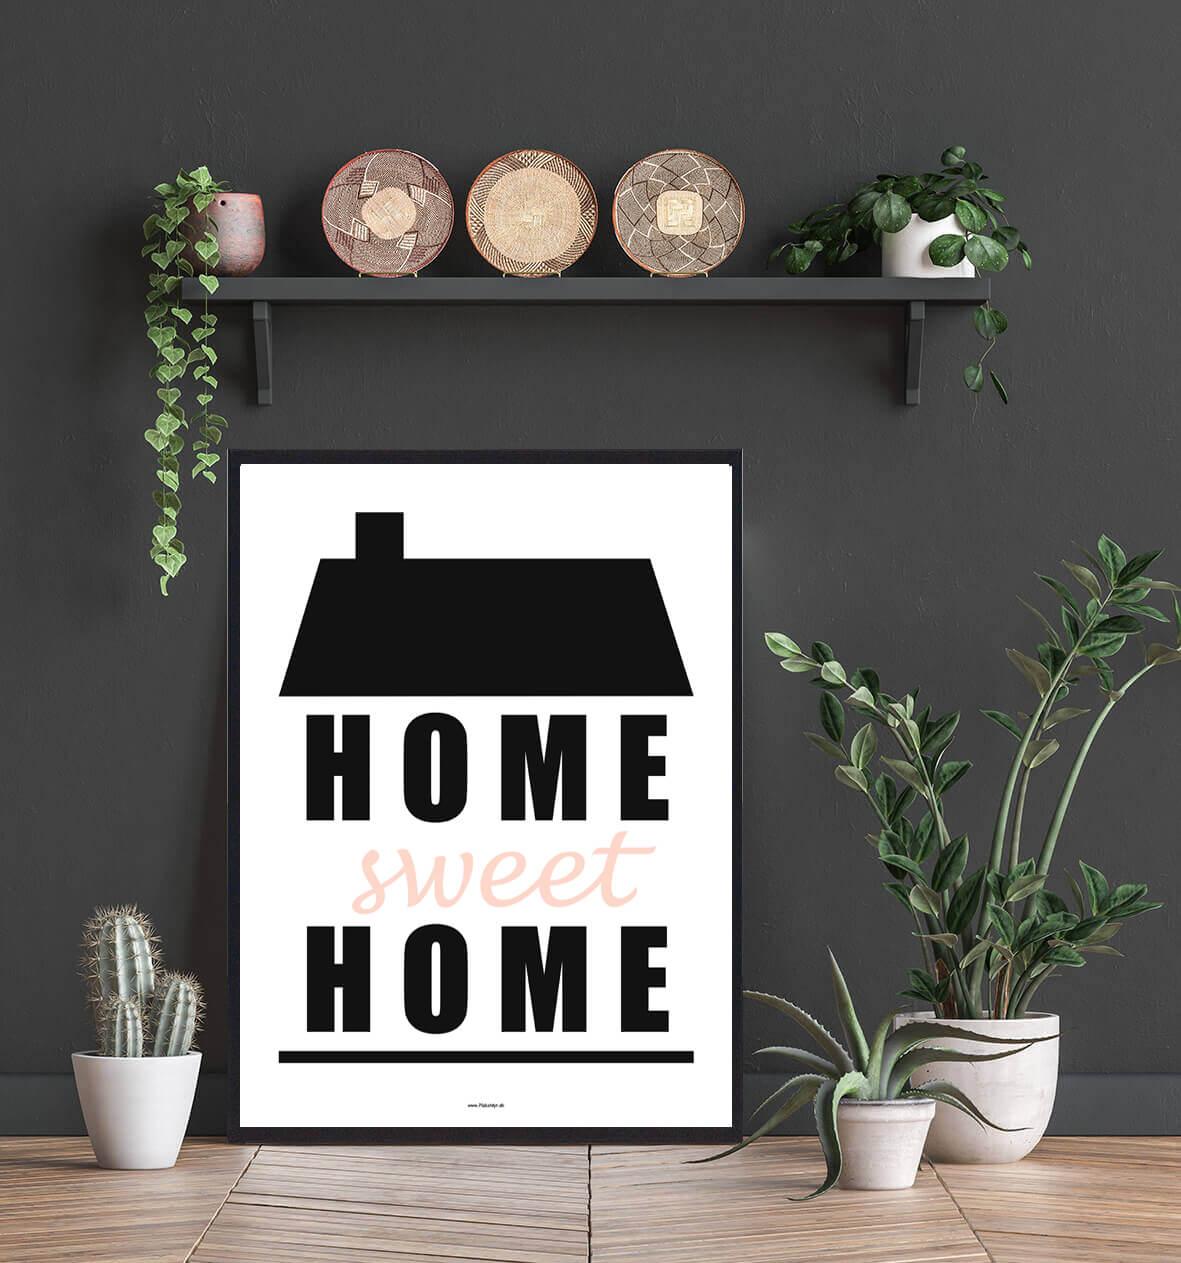 Home-sweet-home-1